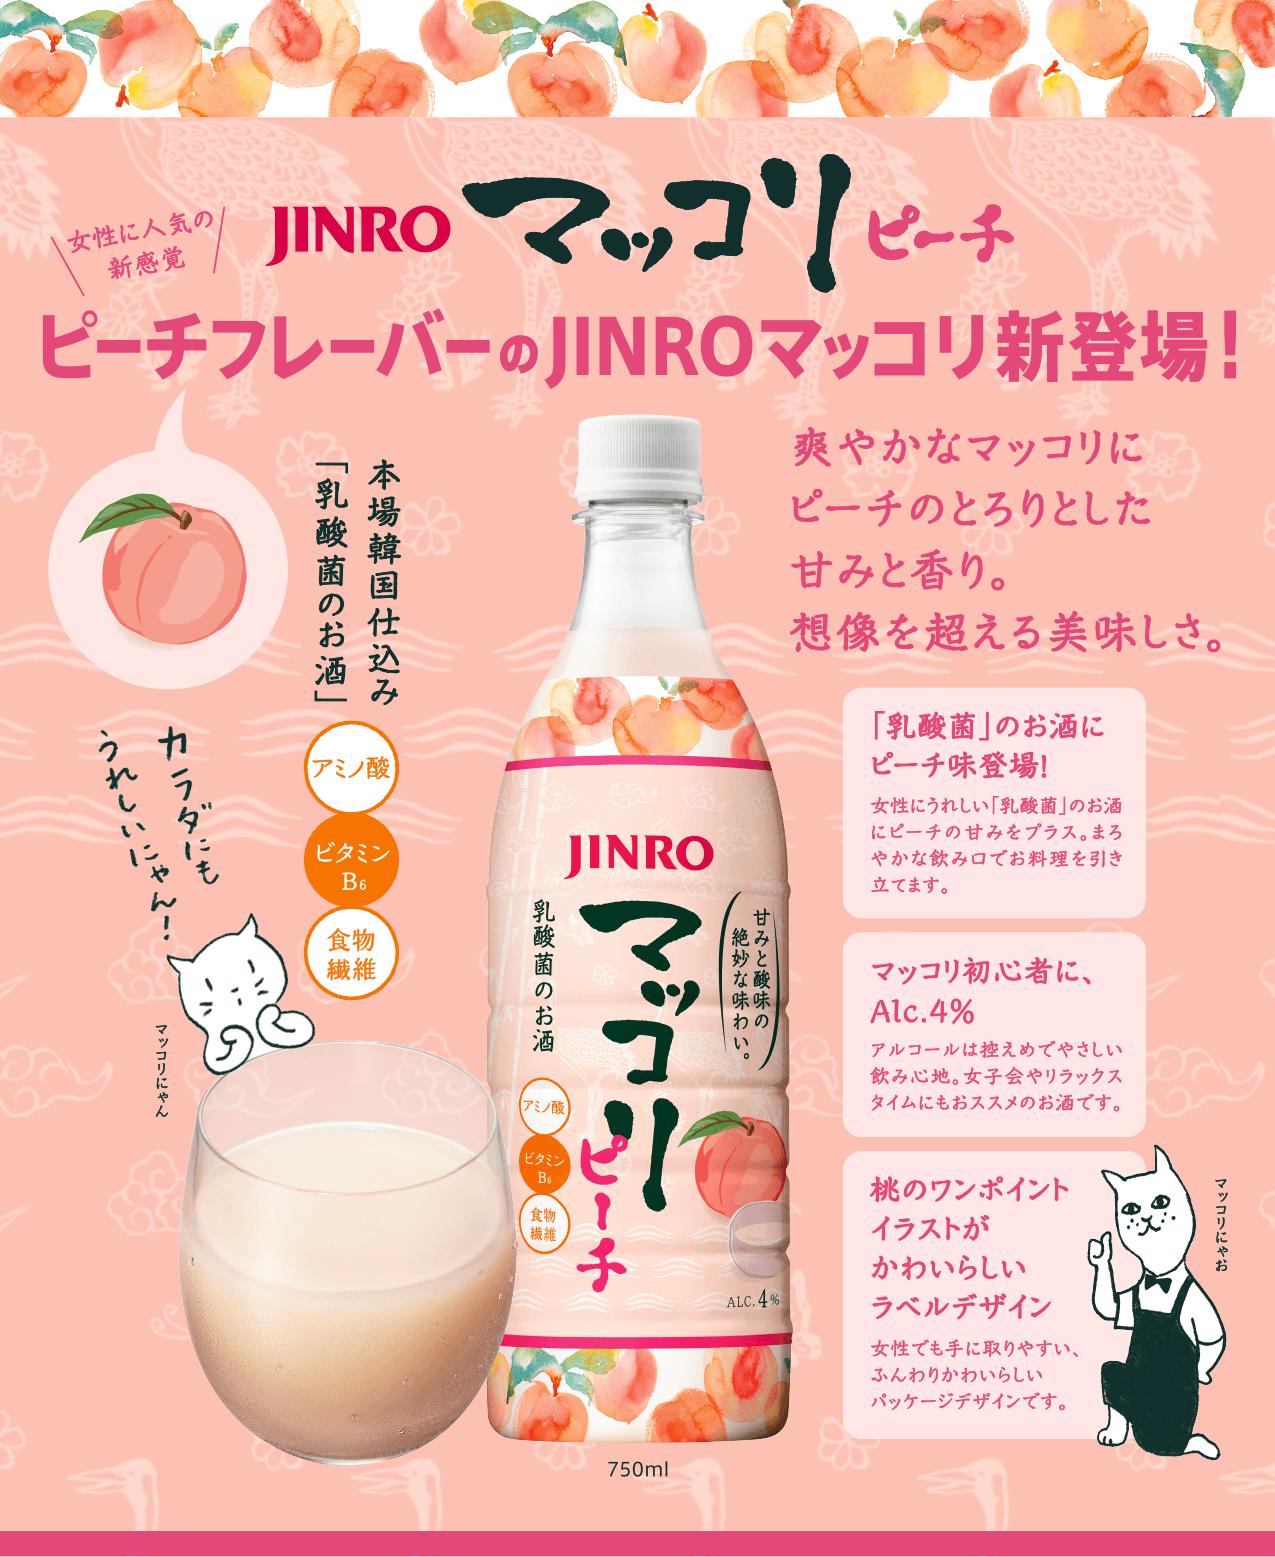 JINRO マッコリ ピーチ ピーチフレーバーのJINROマッコリ新登場!爽やかなマッコリにピーチのとろりとした甘みと香り。想像を超える美味しさ。